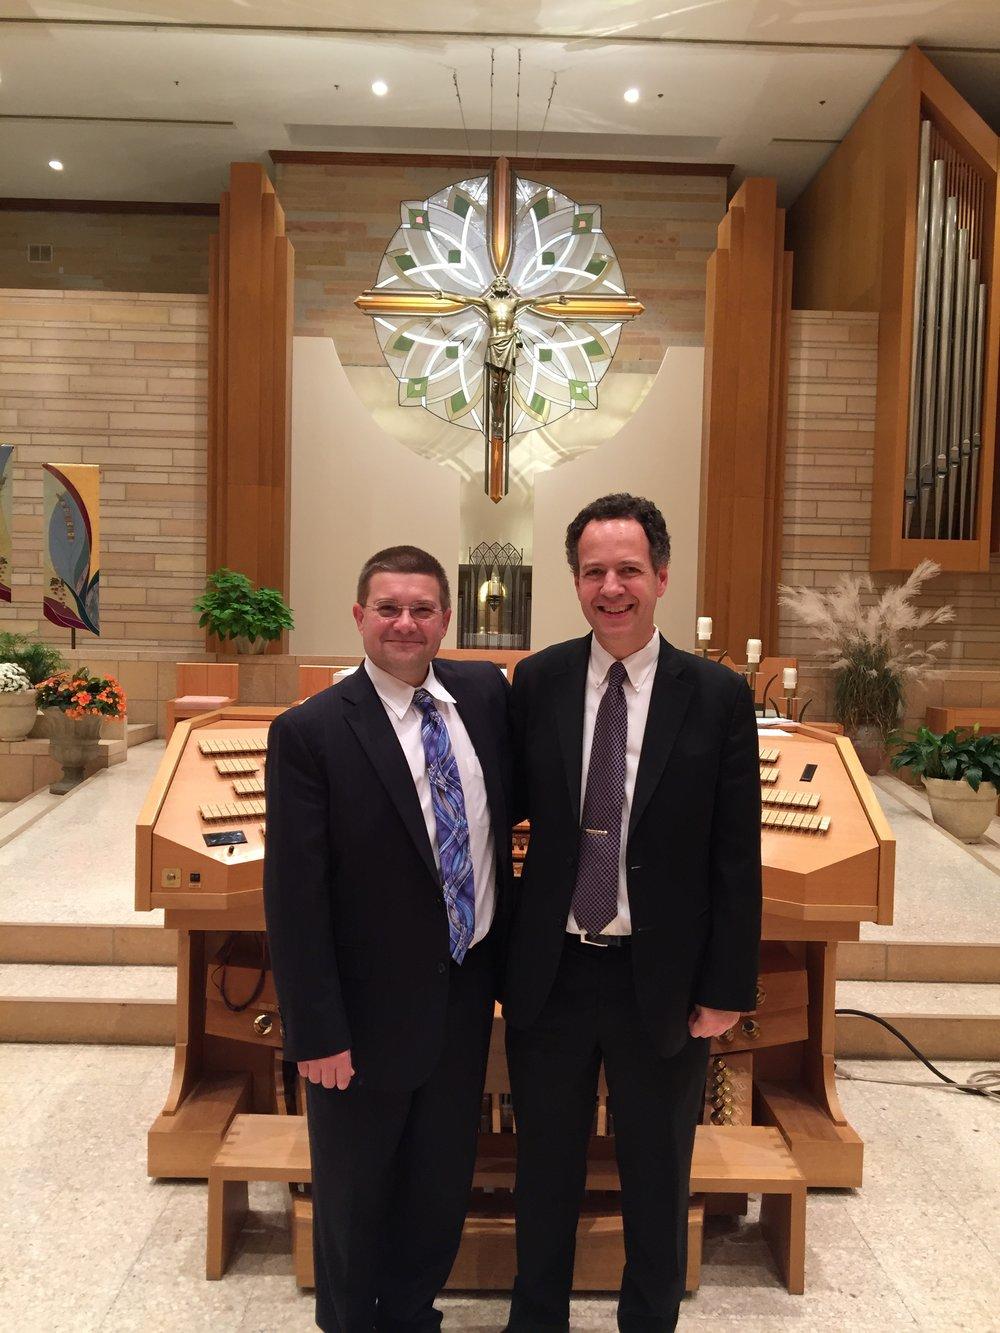 With Aaron David Miller